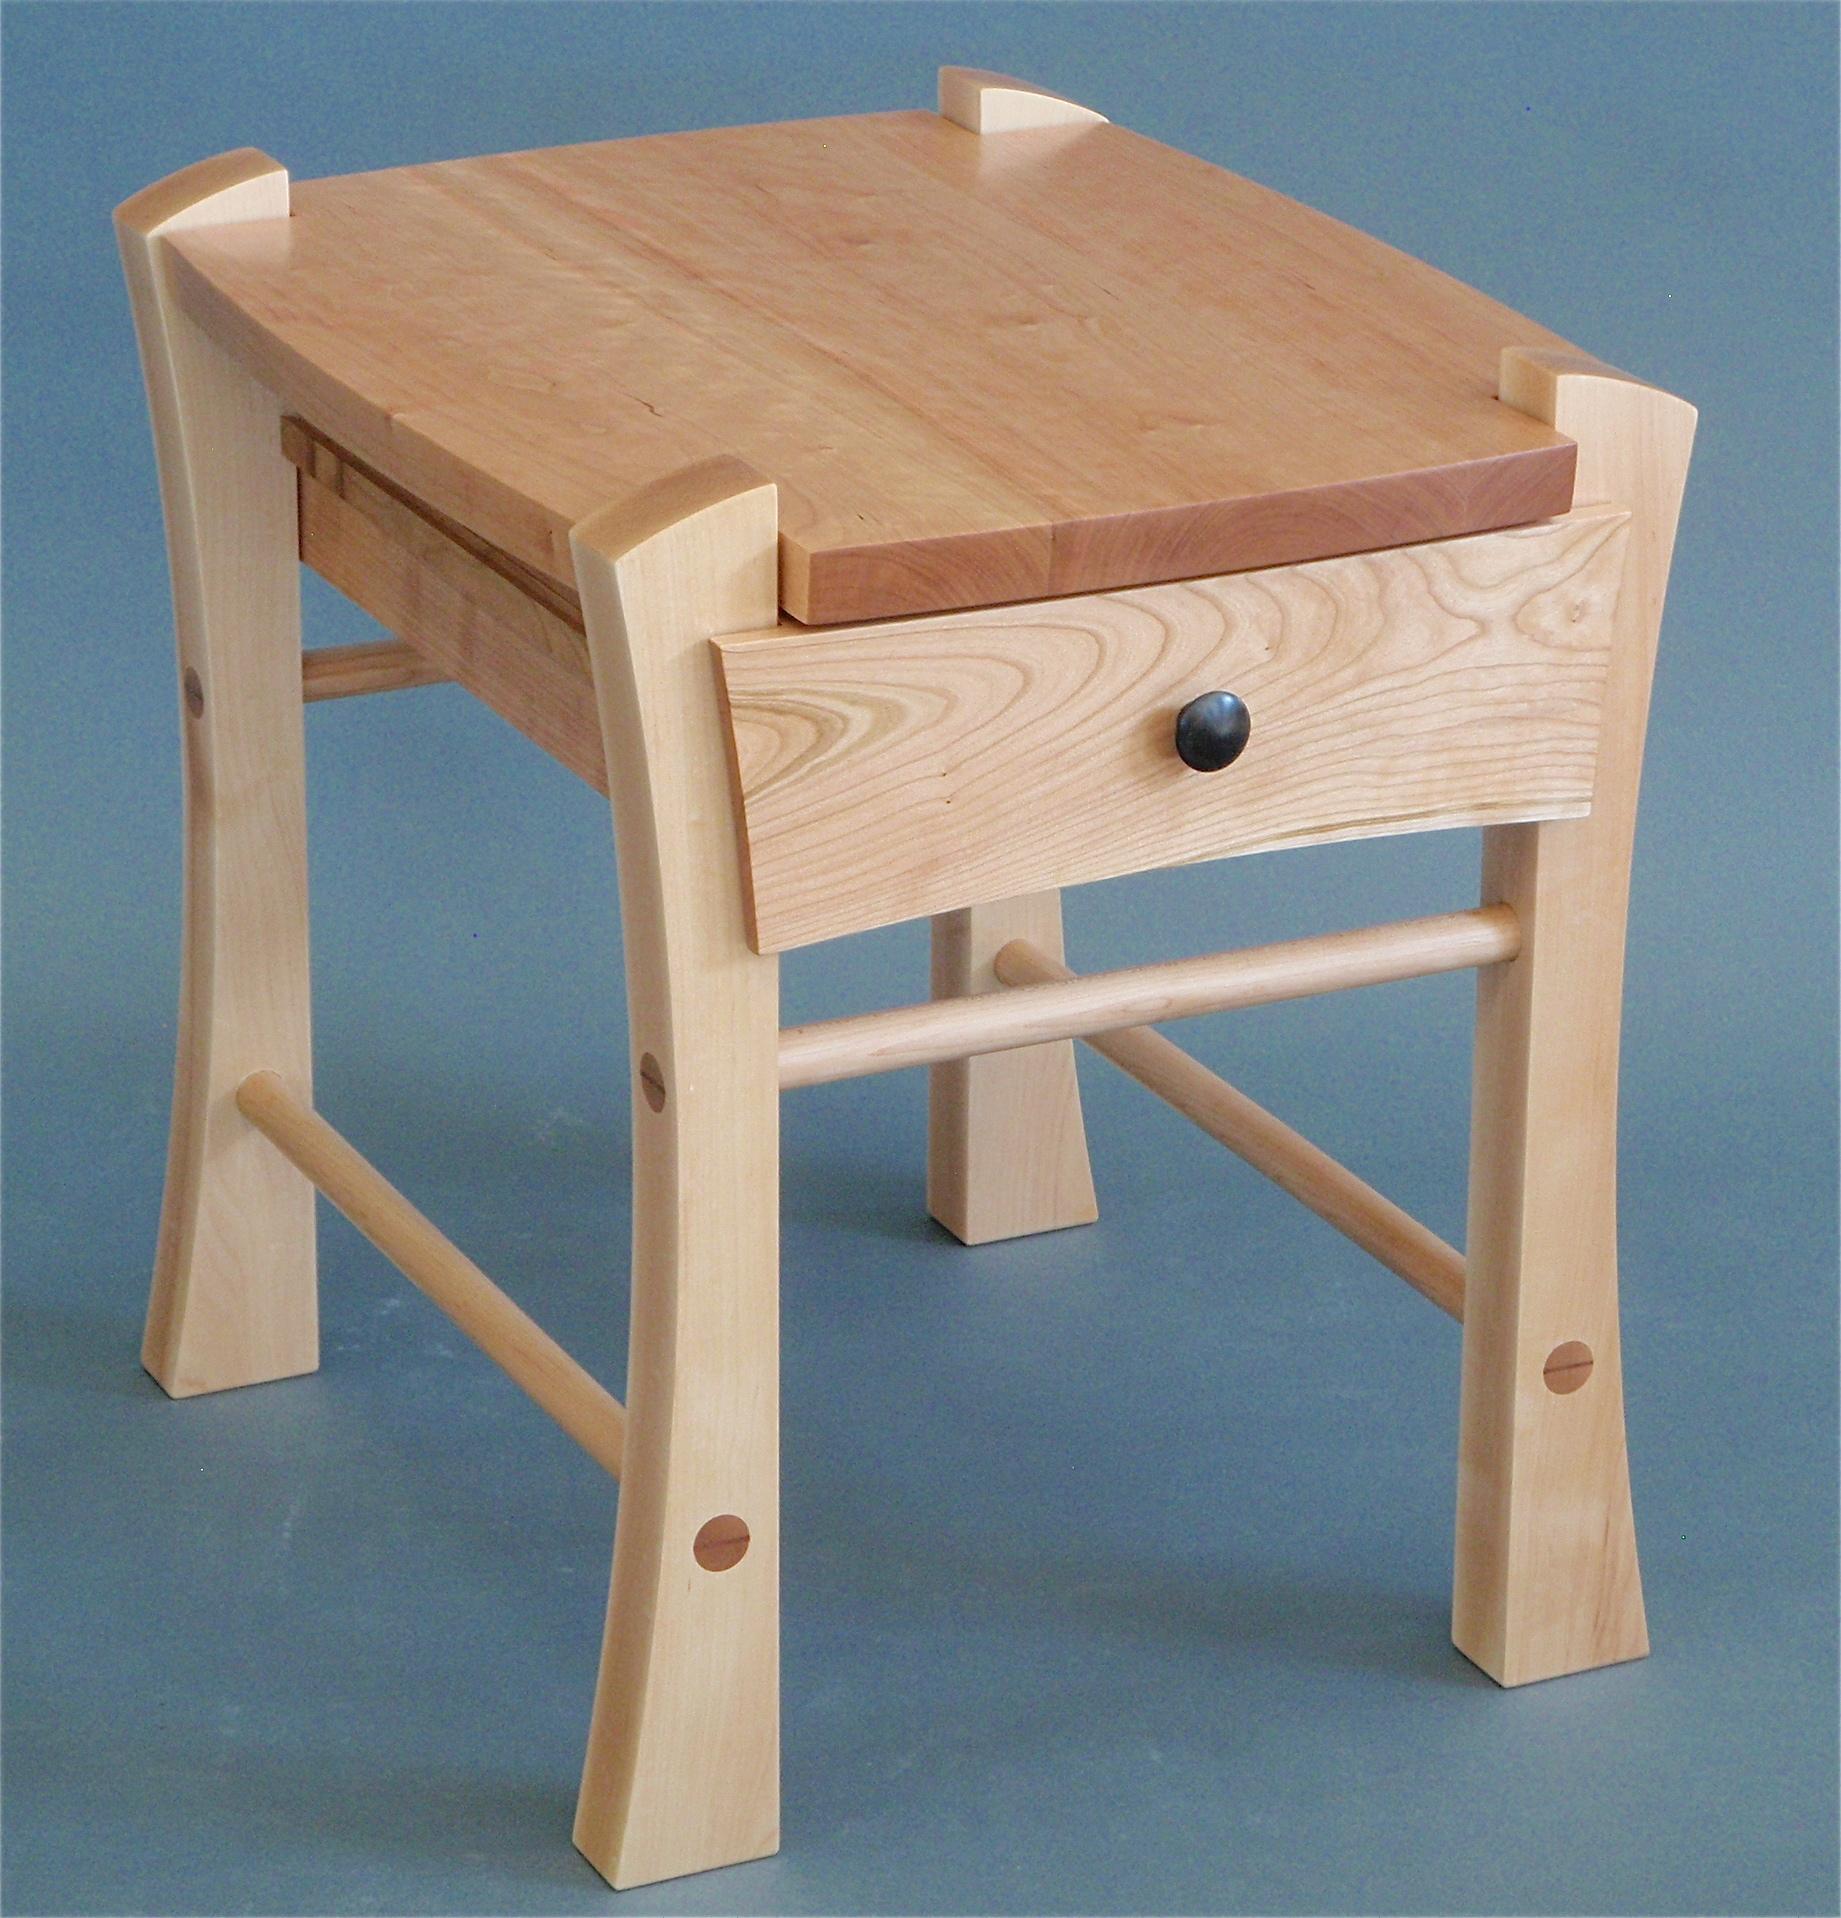 Single drawer bedside table